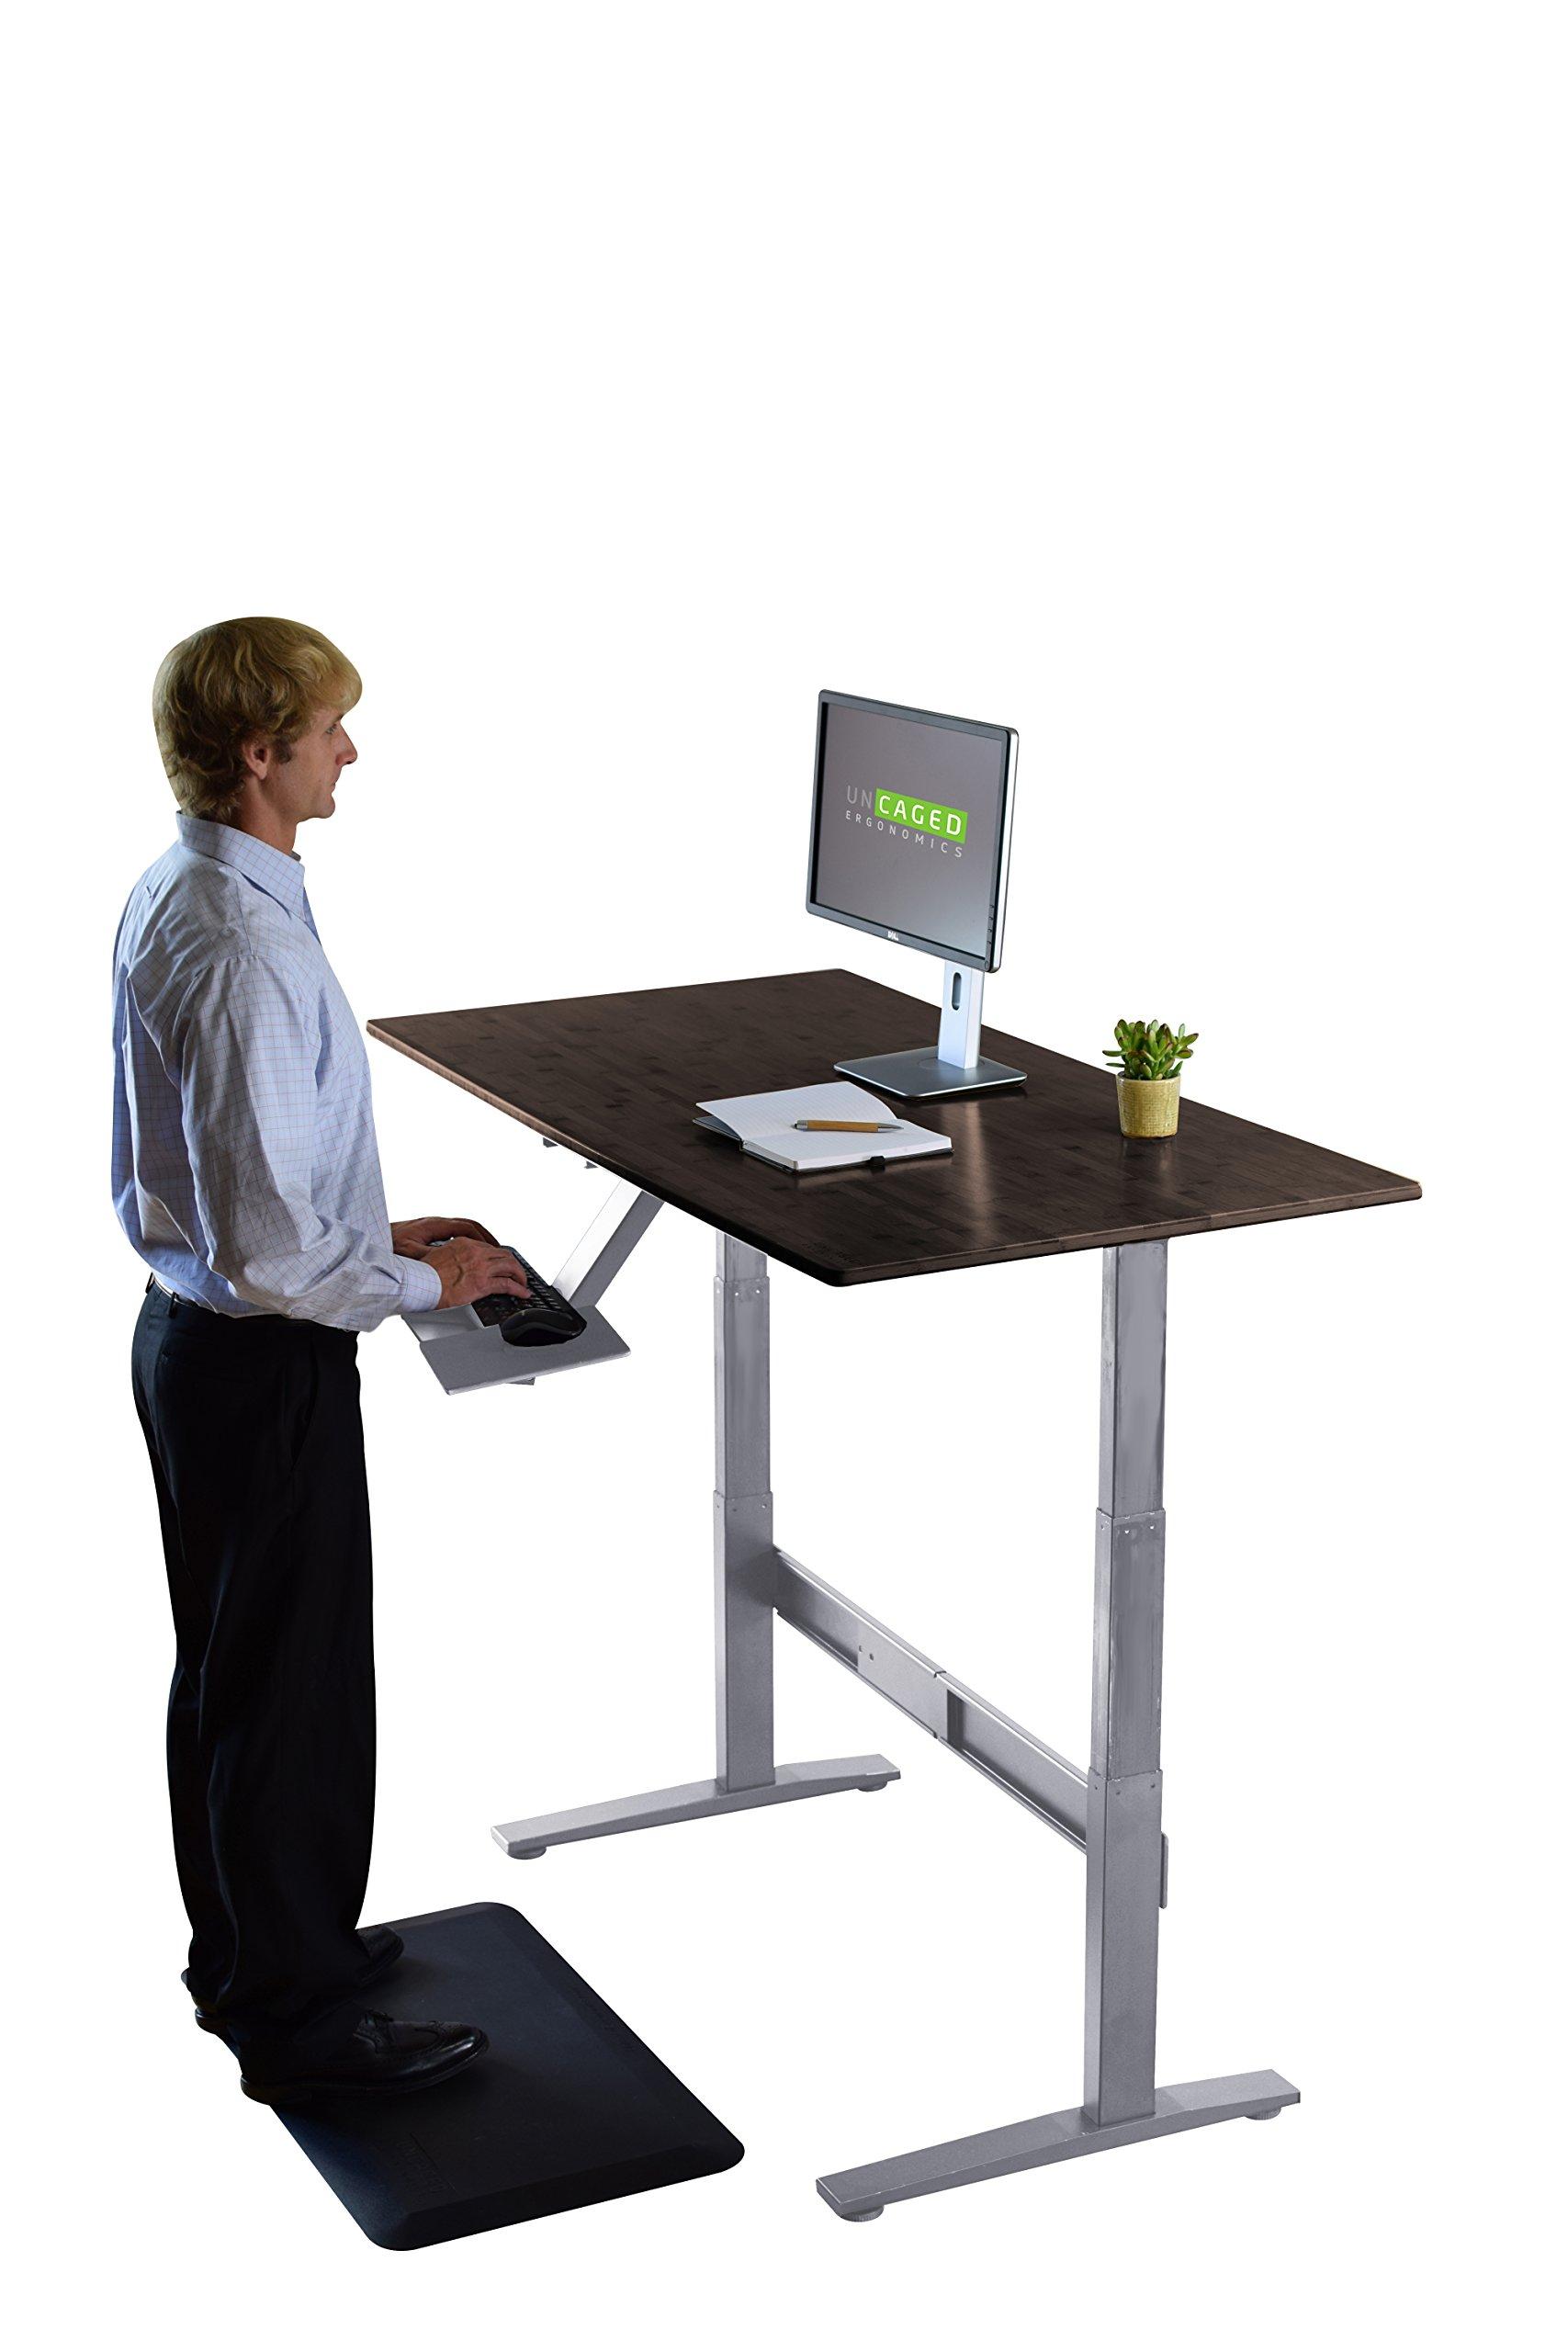 RISE UP Electric Adjustable Height Standing Desk + Beautiful Black Bamboo Desktop| Memory Keypad| 2 Motors| Affordable Ergonomic Sit Stand Office Desk by Uncaged Ergonomics (Image #2)